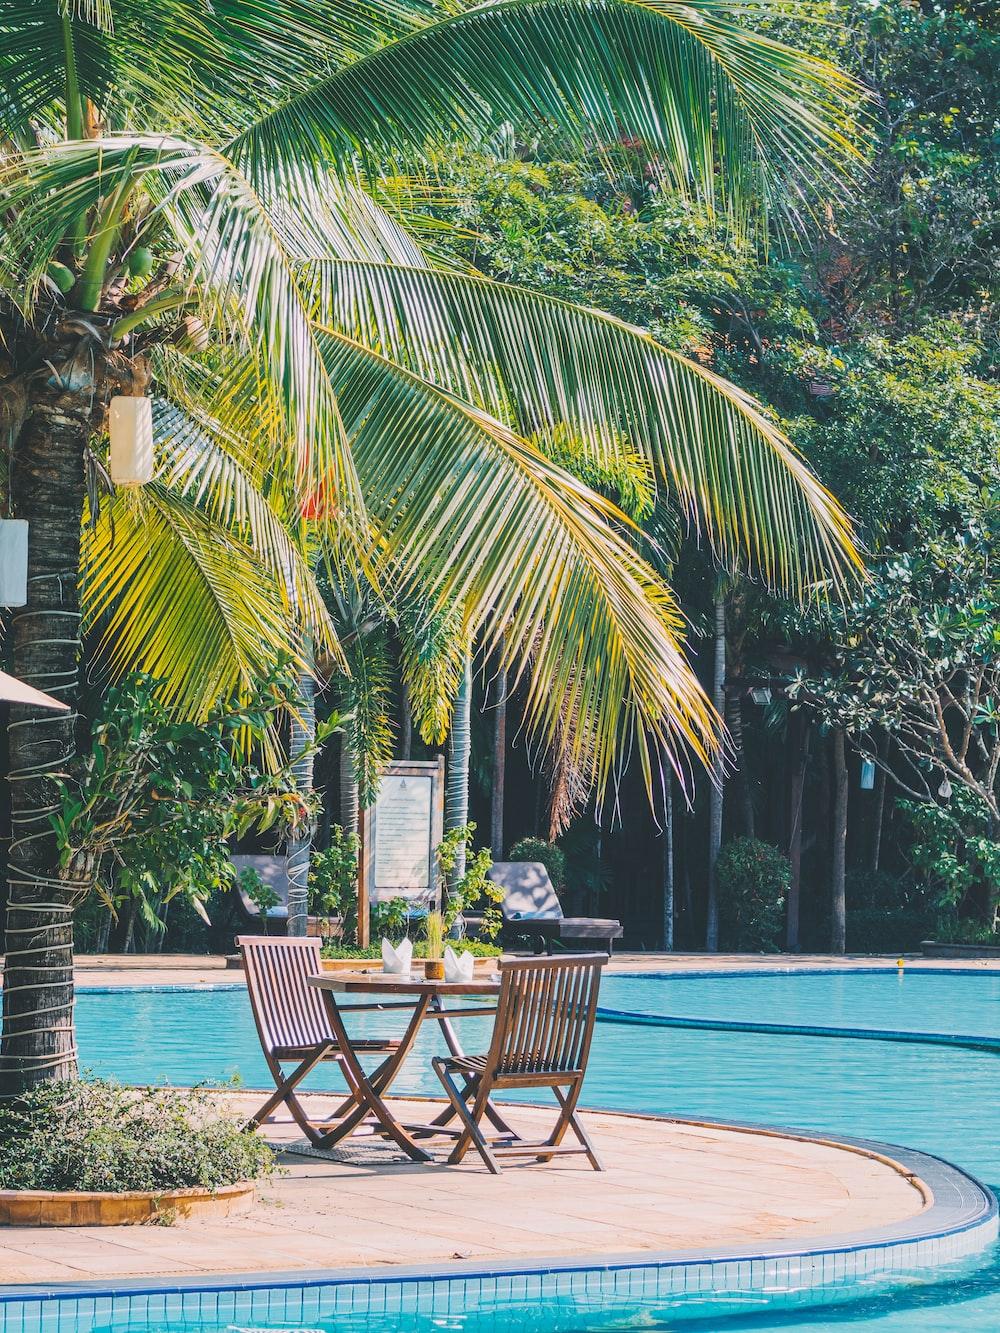 bistro set under coconut tree beside pool side